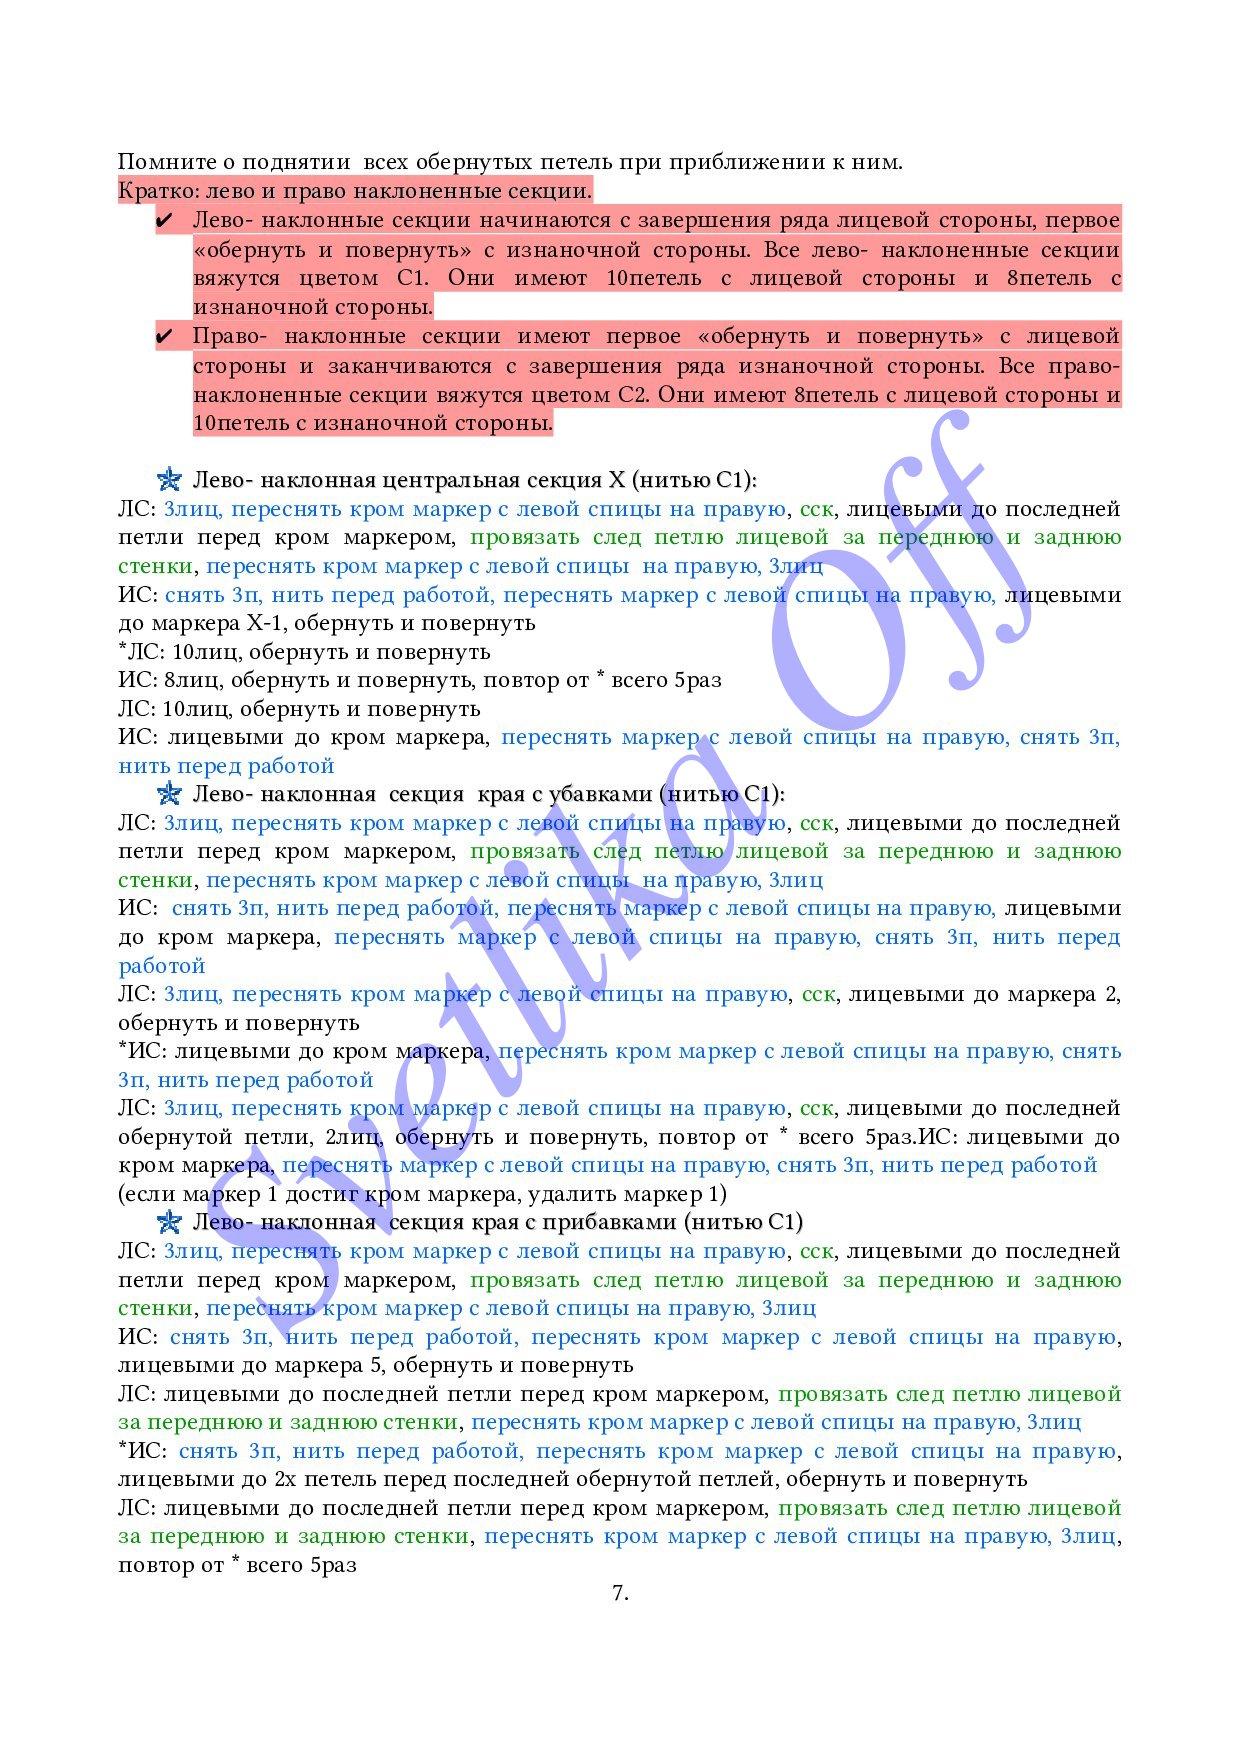 https://img-fotki.yandex.ru/get/113457/125862467.93/0_1abcbc_7bd837ca_orig